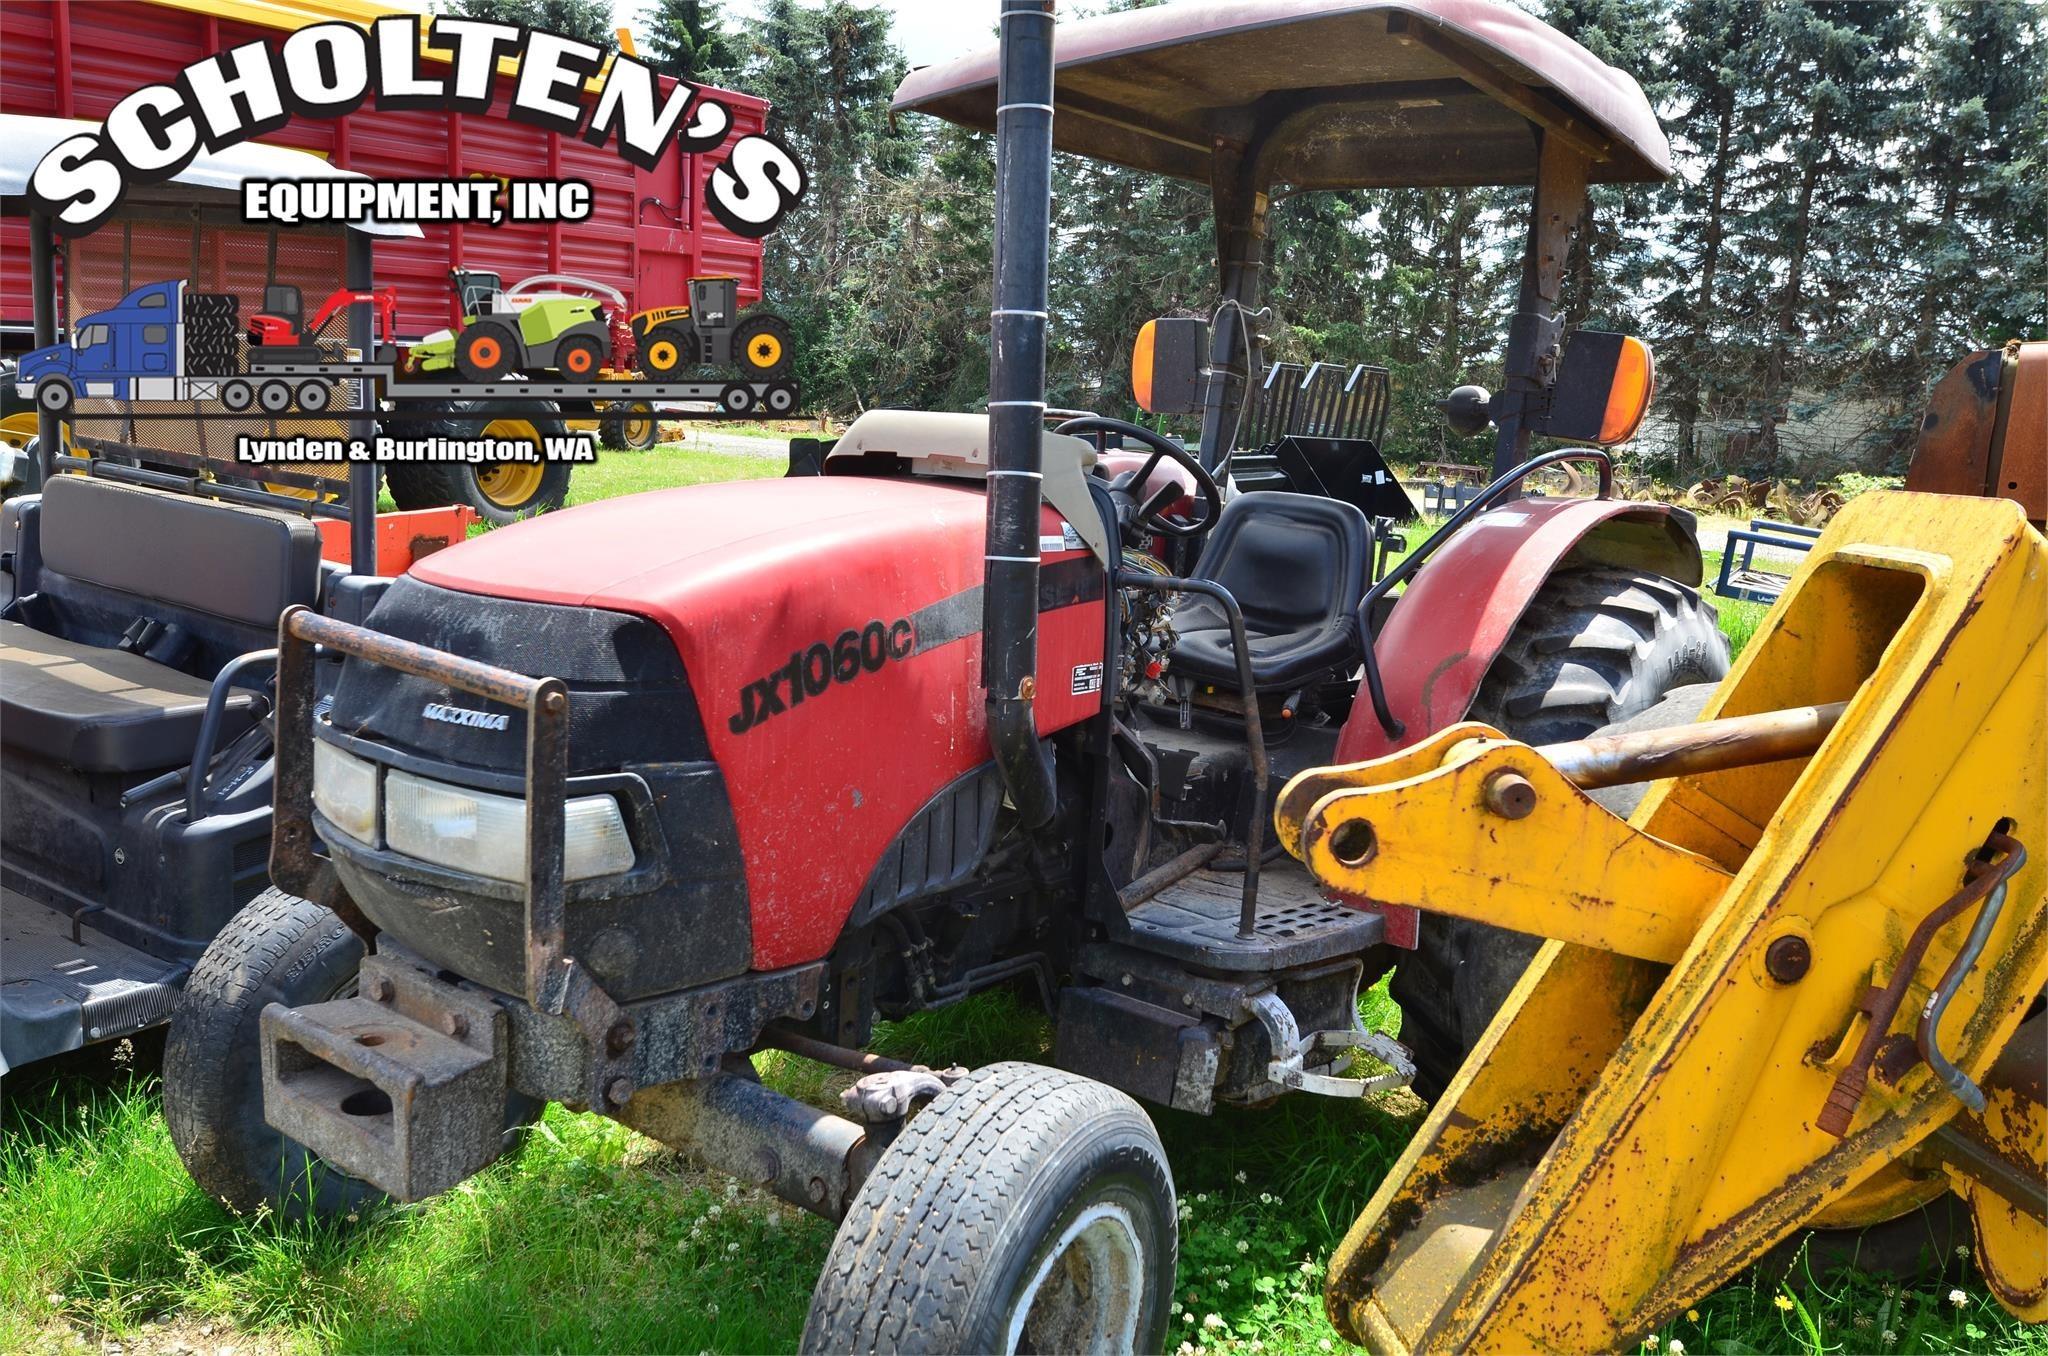 2005 Case IH JX1060C Tractor